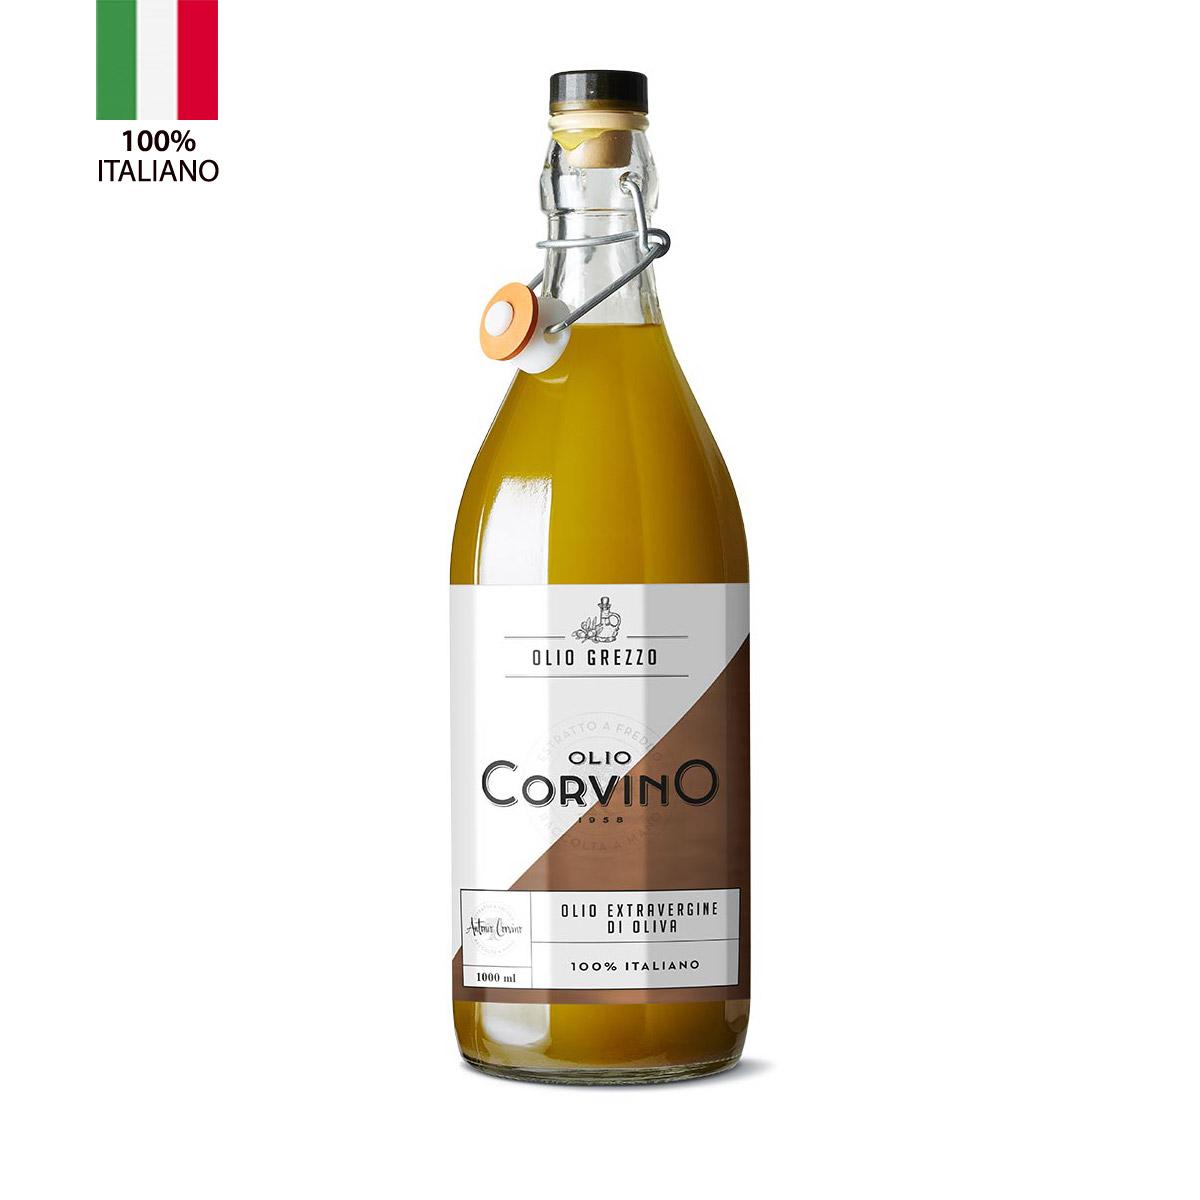 Olio Extravergine D'Oliva  Grezzo bottiglia 1 litro